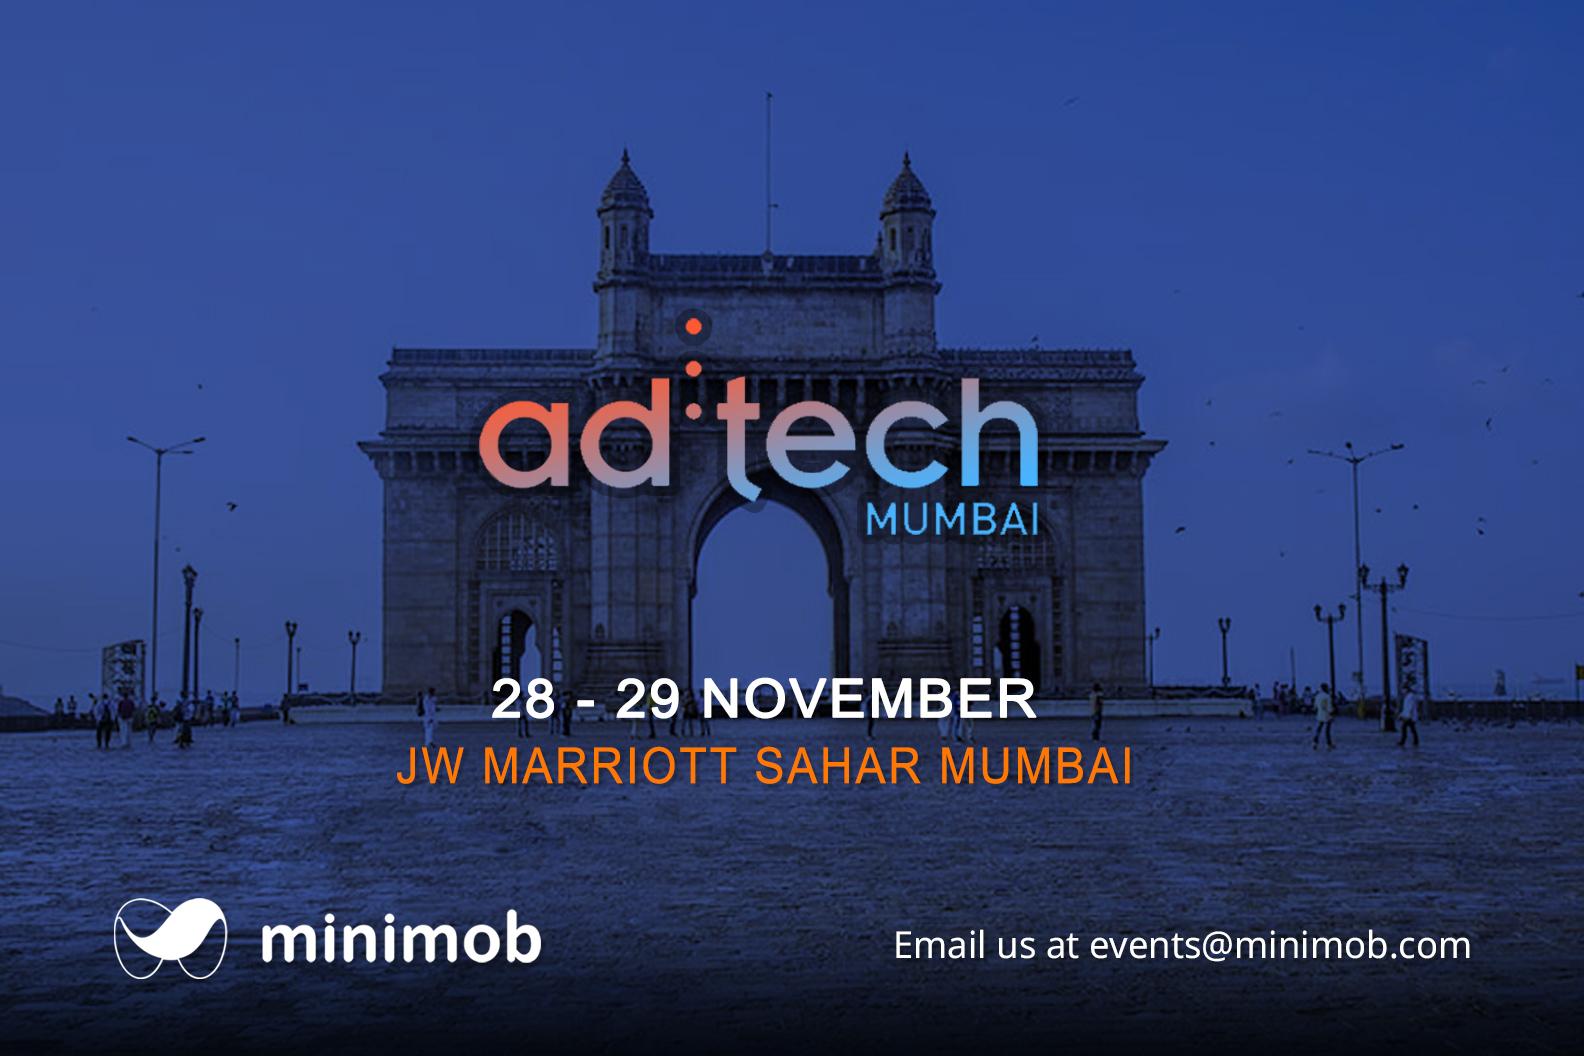 Adtech_Mumbai2018_linkedin_792x528_2x